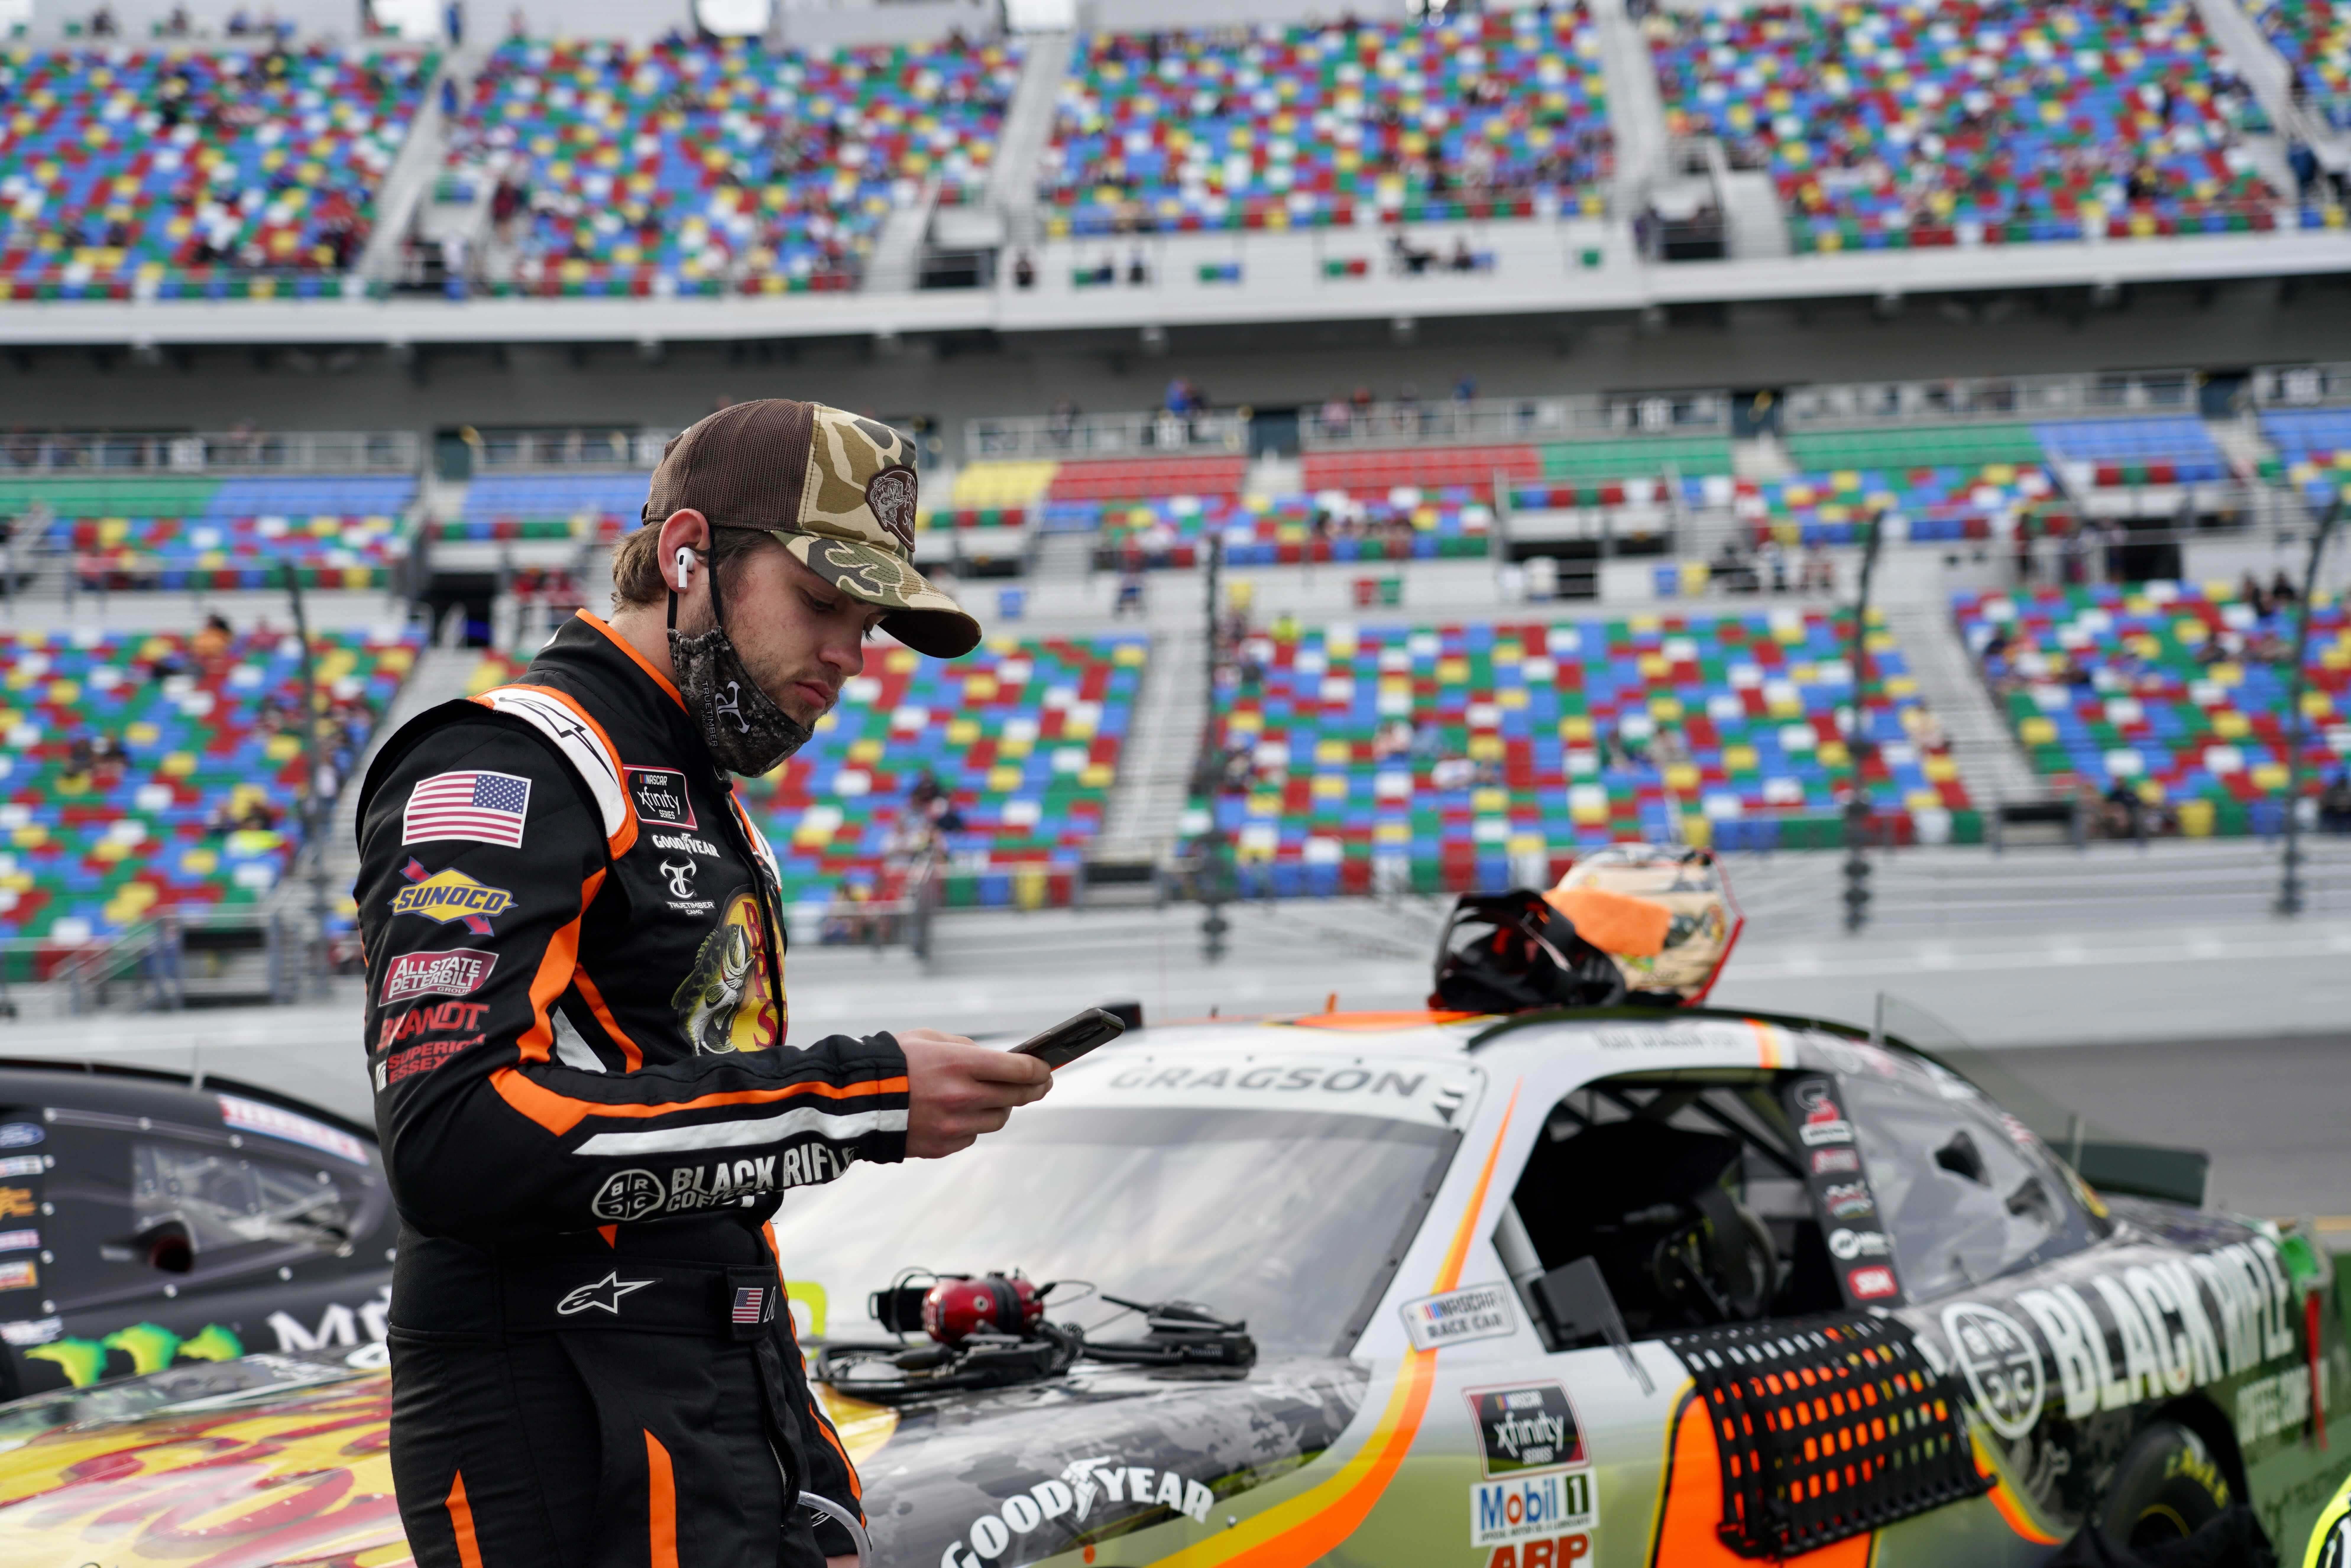 Noah Gragson on his phone at Daytona International Speedway - NASCAR Xfinity Series